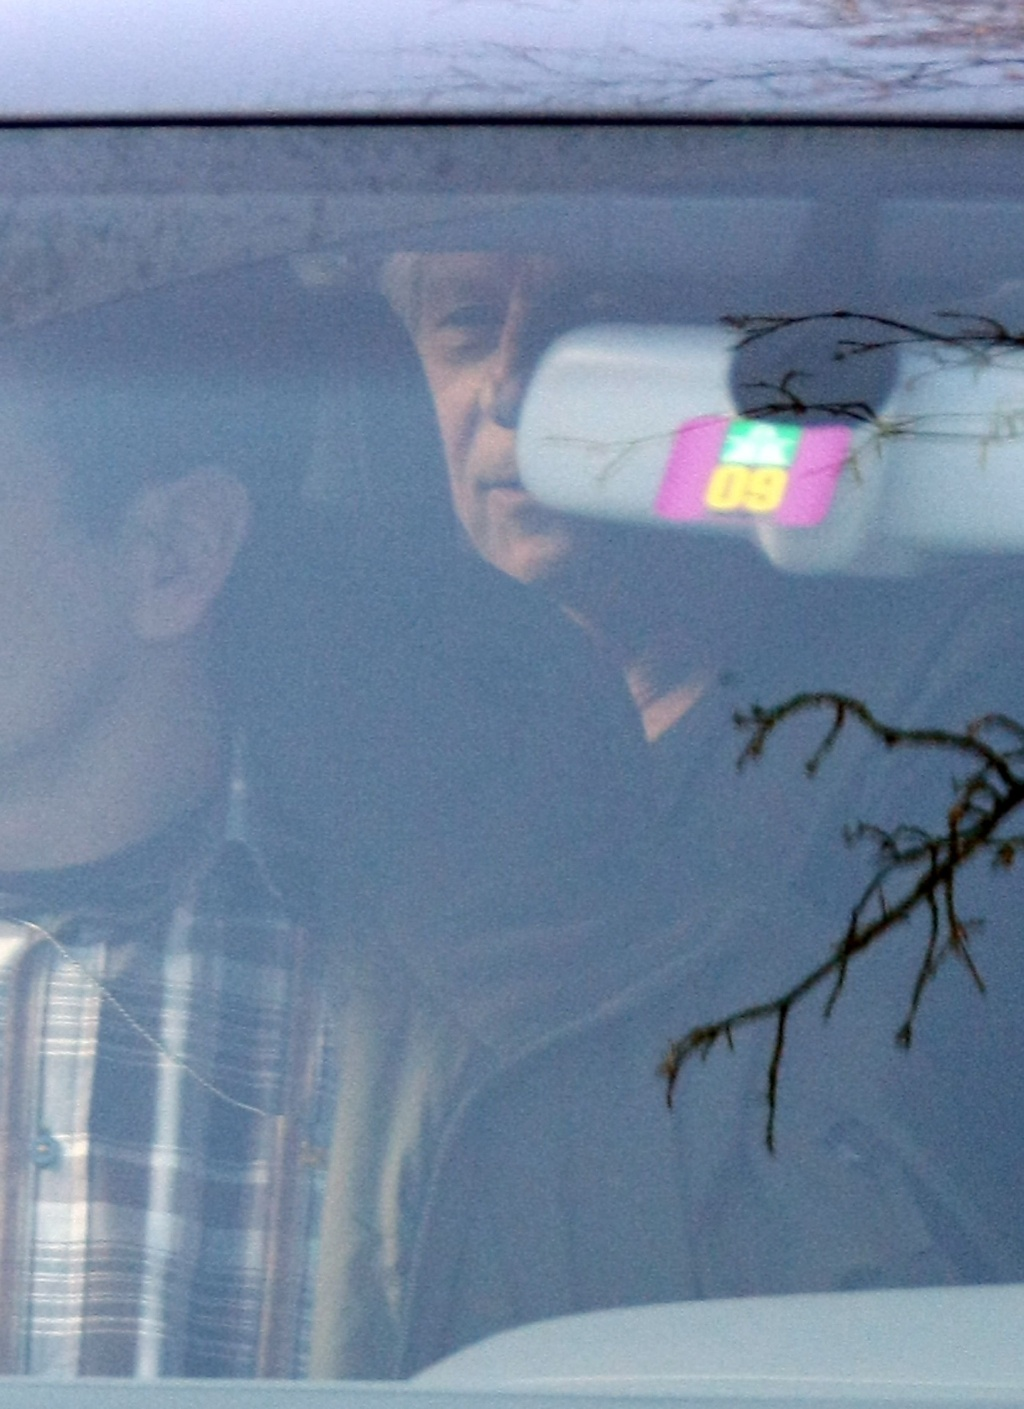 Roman Polanki é levado pela polícia para seu chalé em Gstaad, na Suíça, onde cumpre prisão domiciliar (4/12/09)